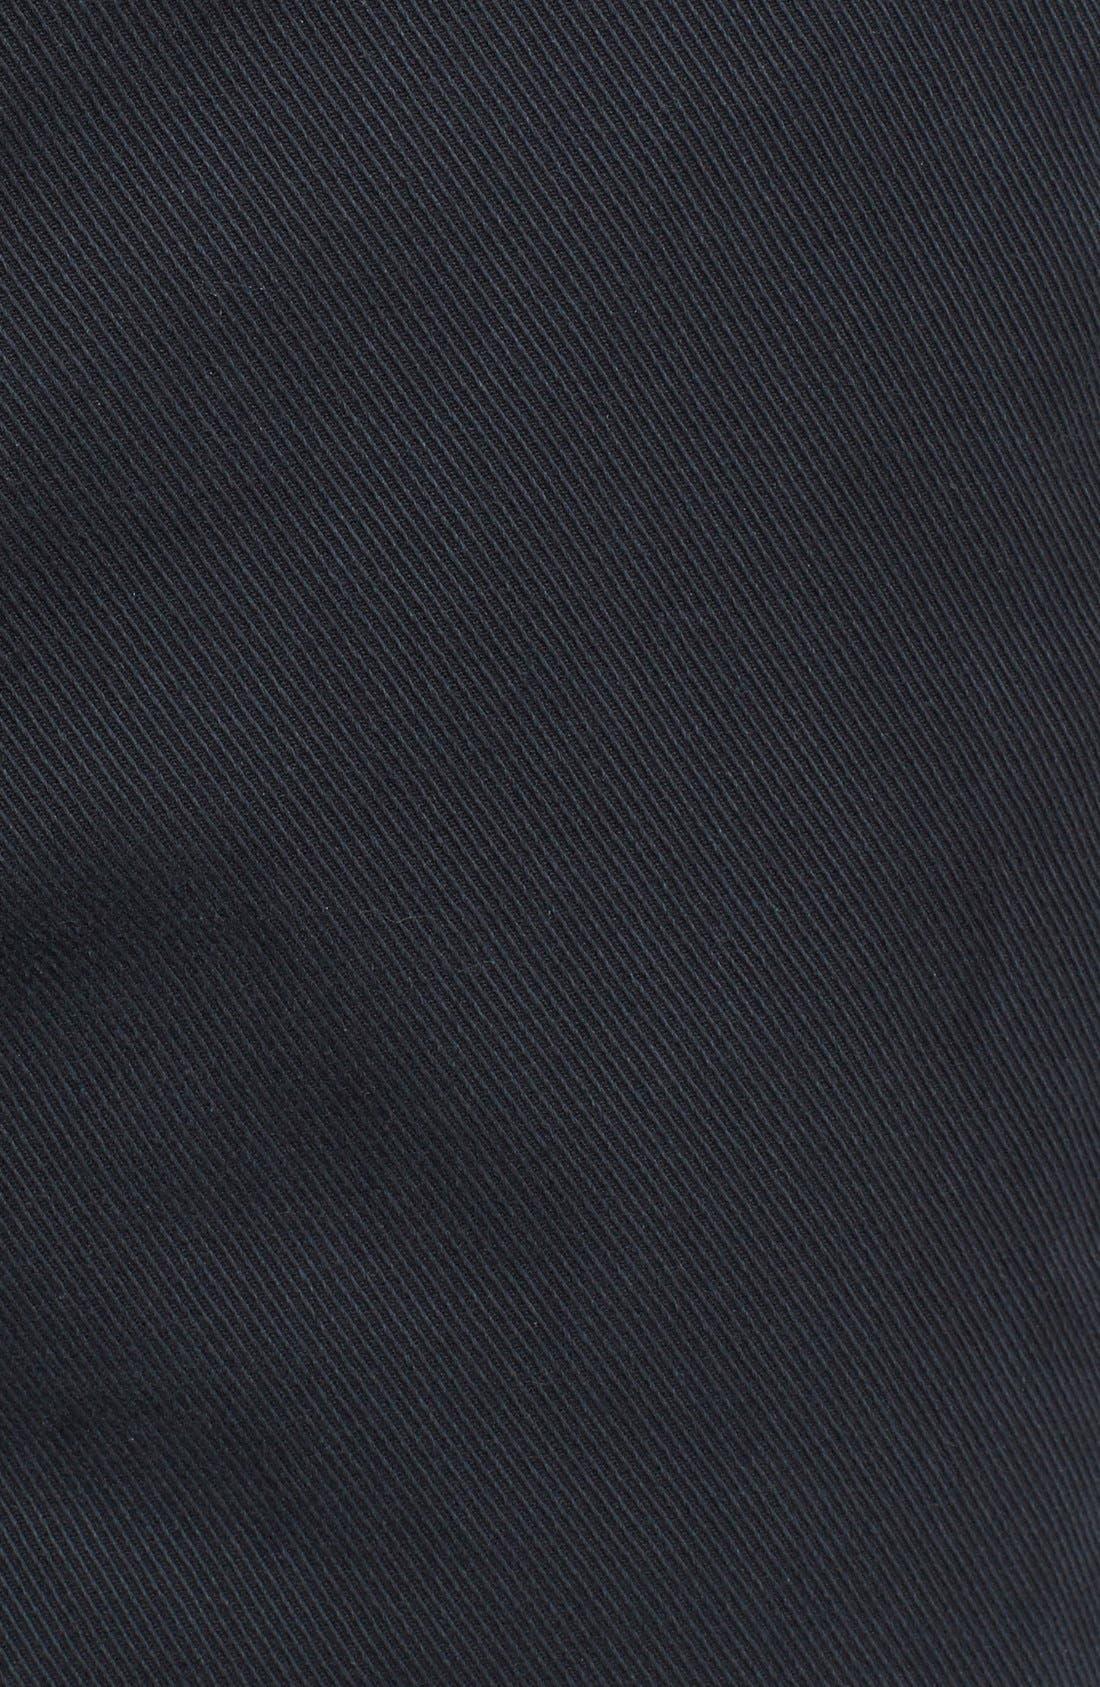 Curtis Flat Front Five-Pocket Cotton Twill Pants,                             Alternate thumbnail 6, color,                             BLACK